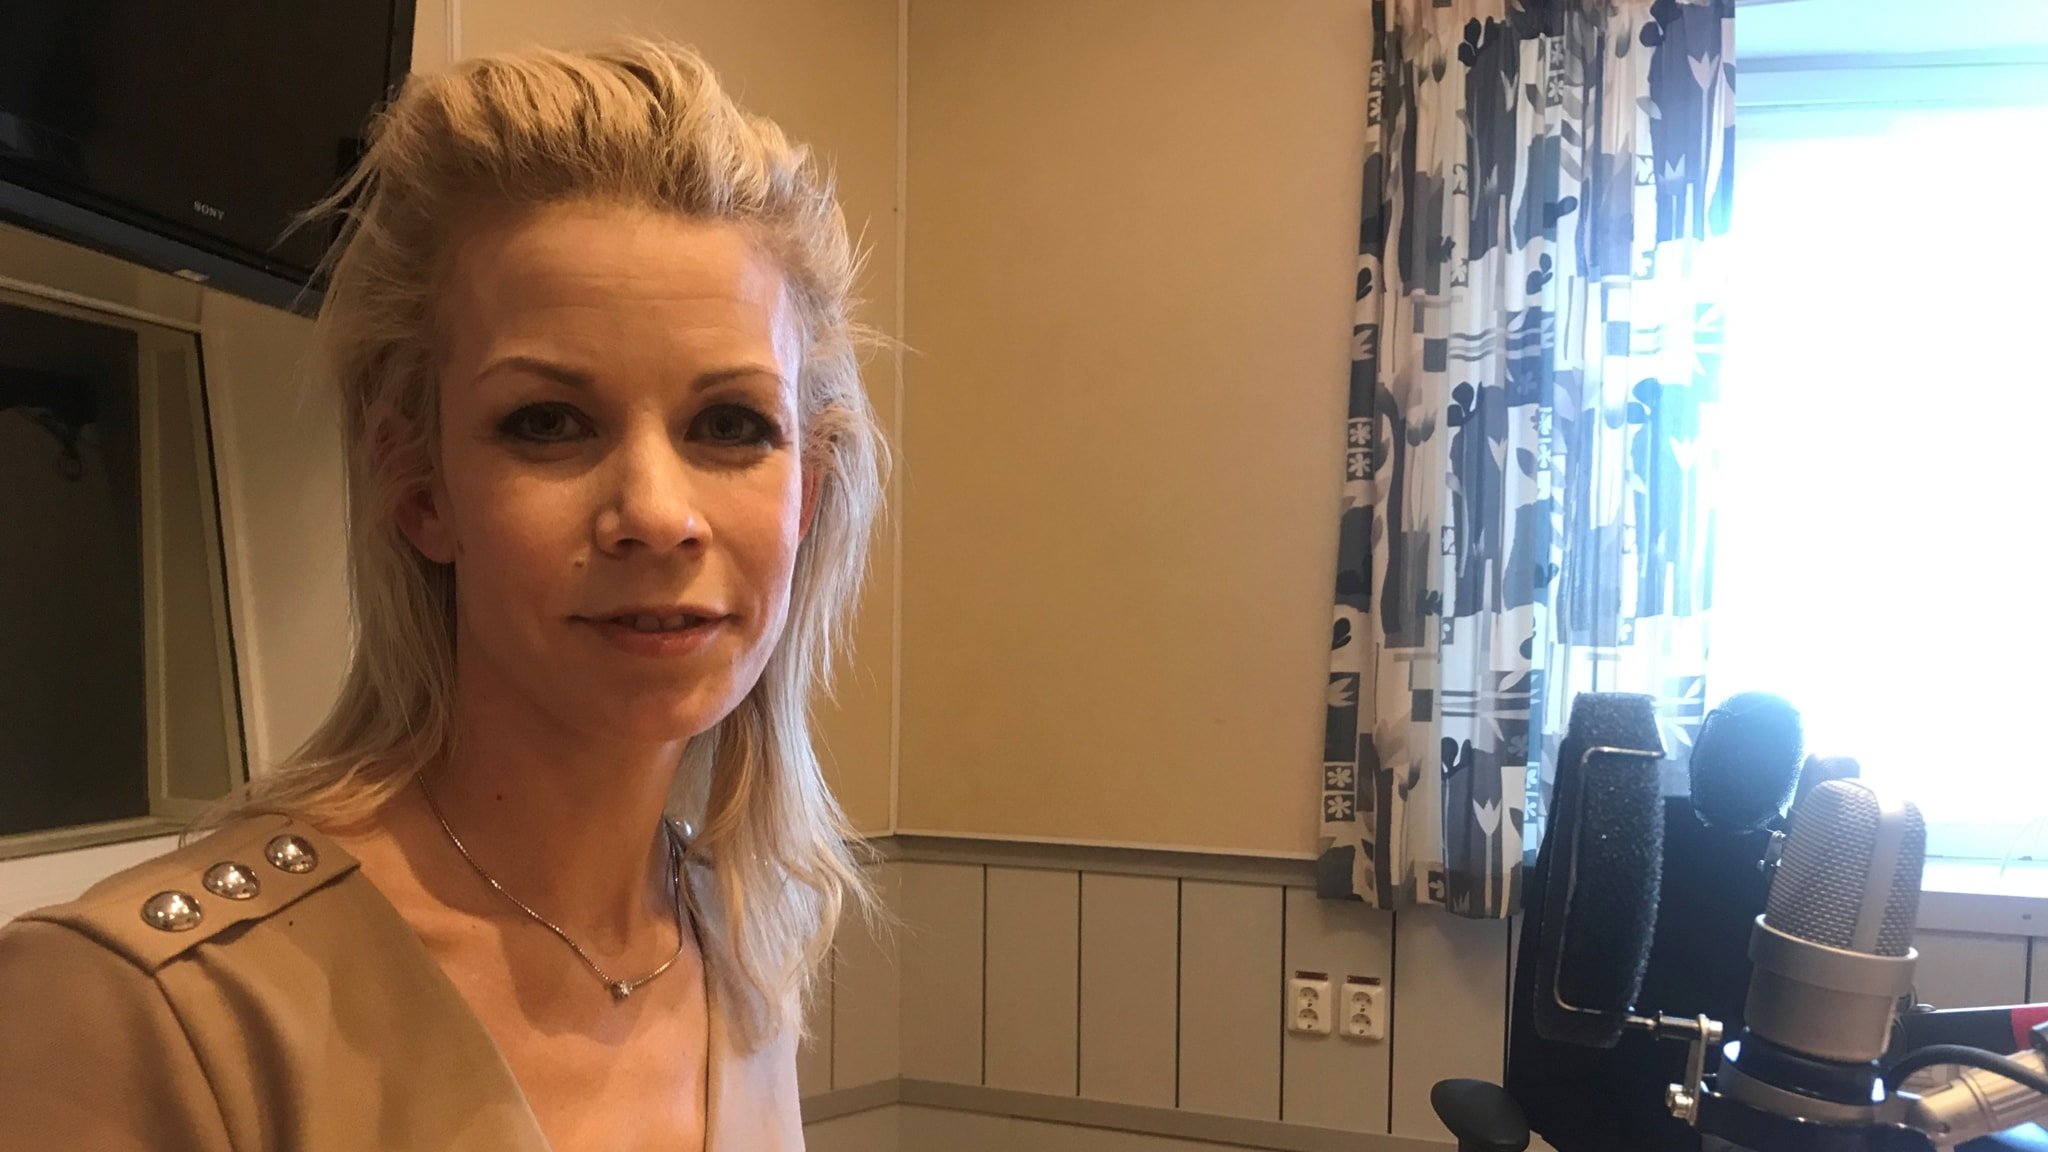 Ekots Lordagsintervju Med Anna Konig Jerlmyr M 30 Mars 2019 Kl 12 55 Ekots Lordagsintervju Sveriges Radio